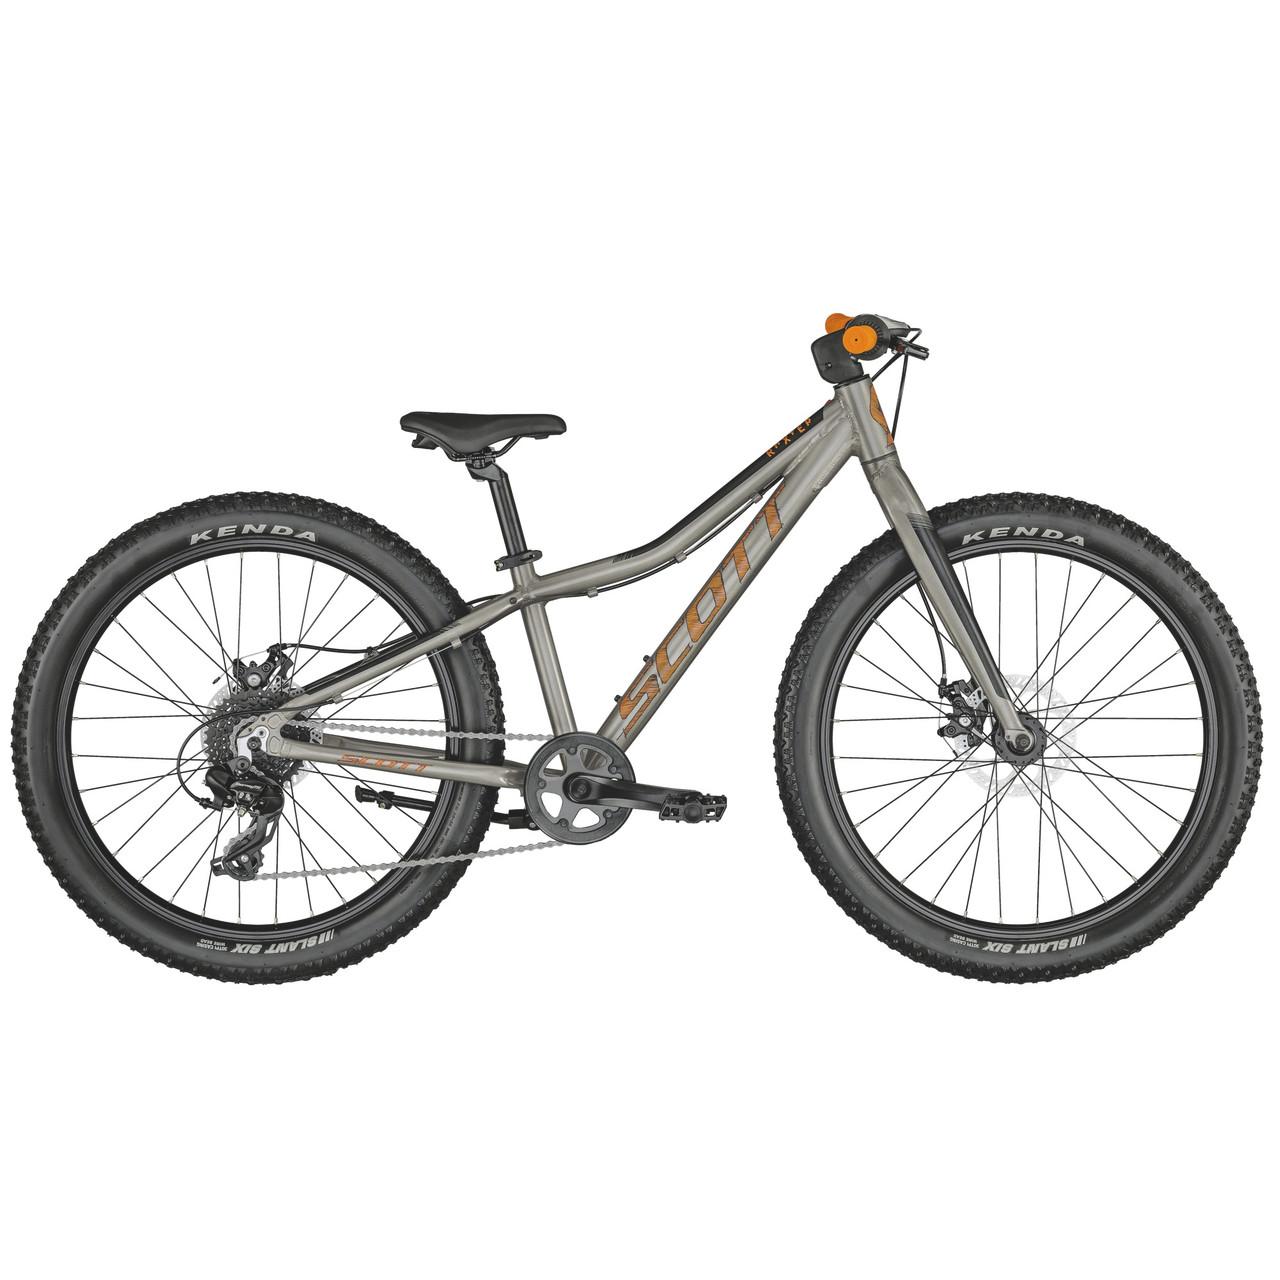 SCOTT ROXTER 24 RAW ALLOY BIKE....Scott Bikes are pick up only in store at Hunter Bikeworx fully assembled